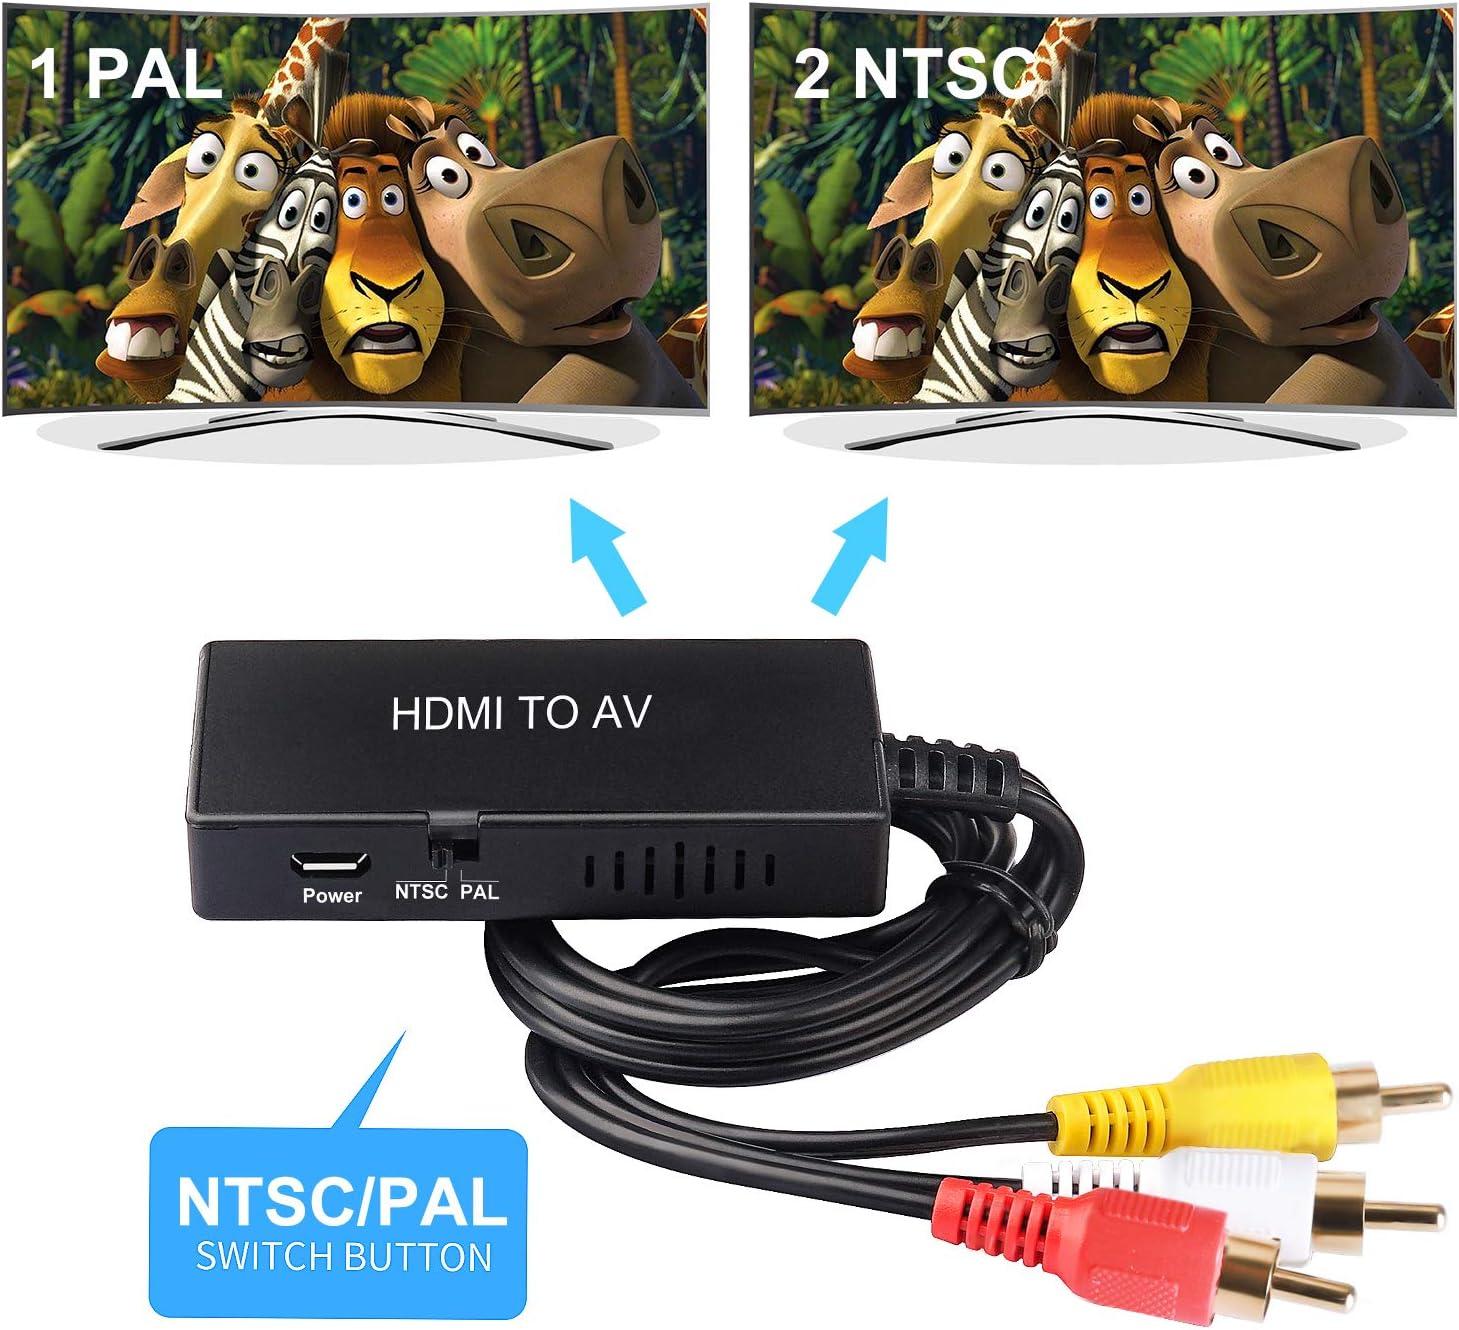 HDMI to RCA Converter, HDMI to AV 3RCA CVBs Composite Video Audio Converter Adapter Supports PAL/NTSC for TV Stick, Roku, Chromecast, Apple TV, PC, Laptop, Xbox, HDTV: Electronics